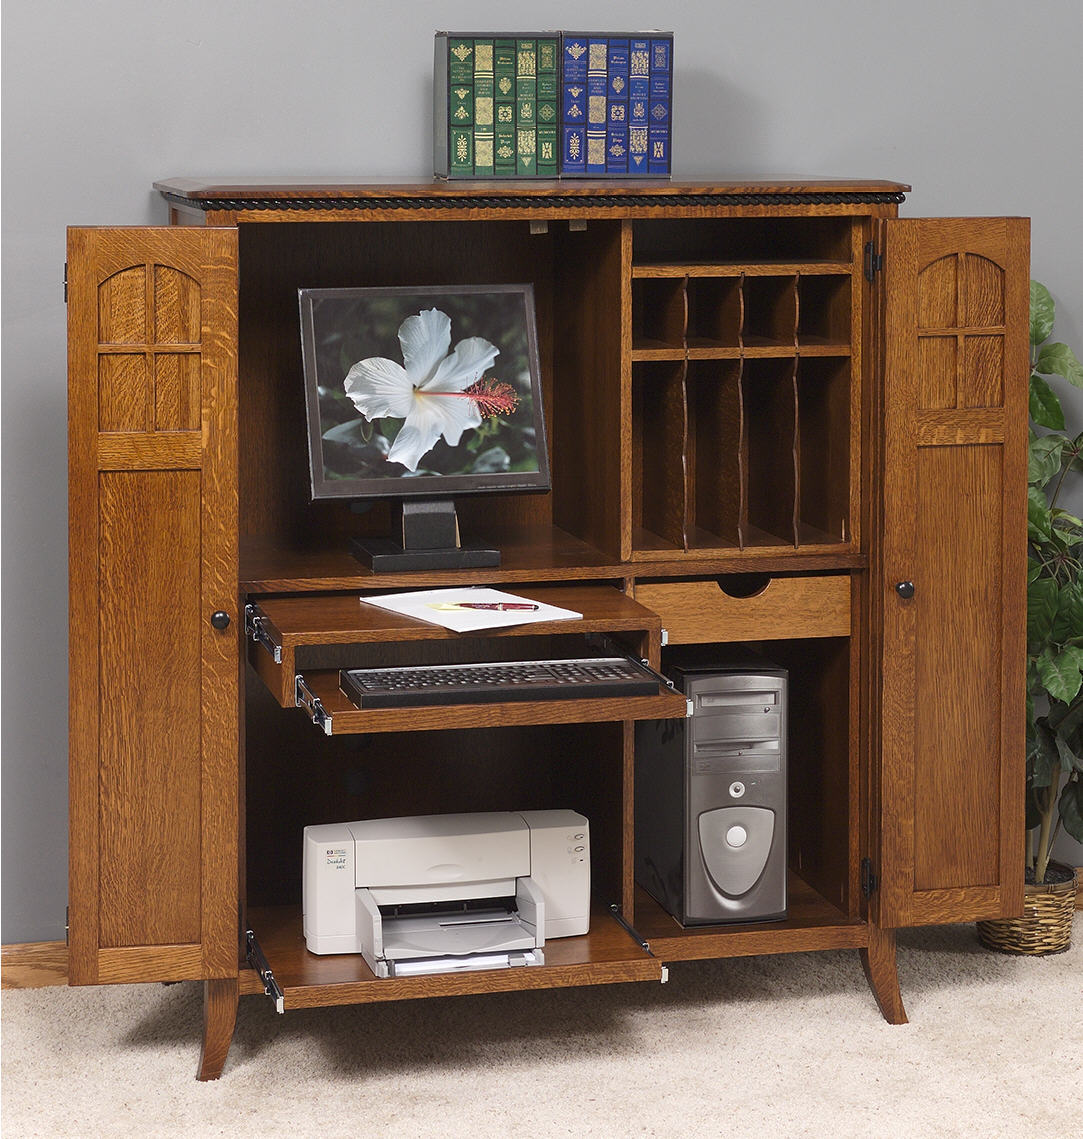 petite mt eaton computer armoire 452 3208 9 office. Black Bedroom Furniture Sets. Home Design Ideas